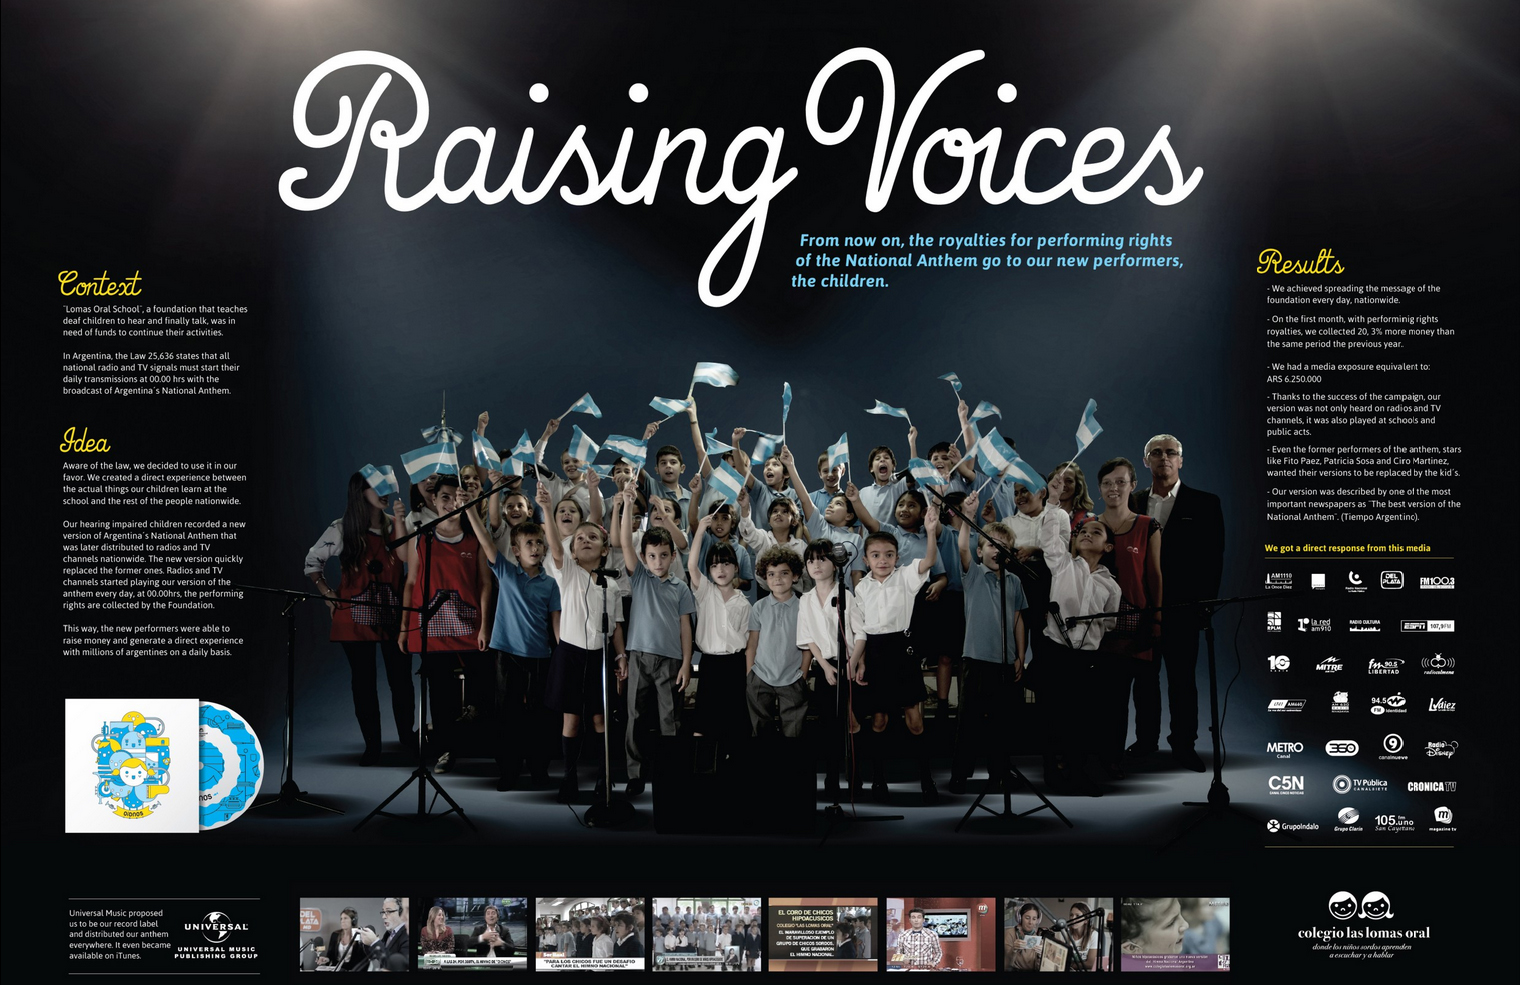 colegio-las-lomas-oral-colegio-las-lomas-oral-raising-voices-media-direct-marketing-361846-adeevee.jpg